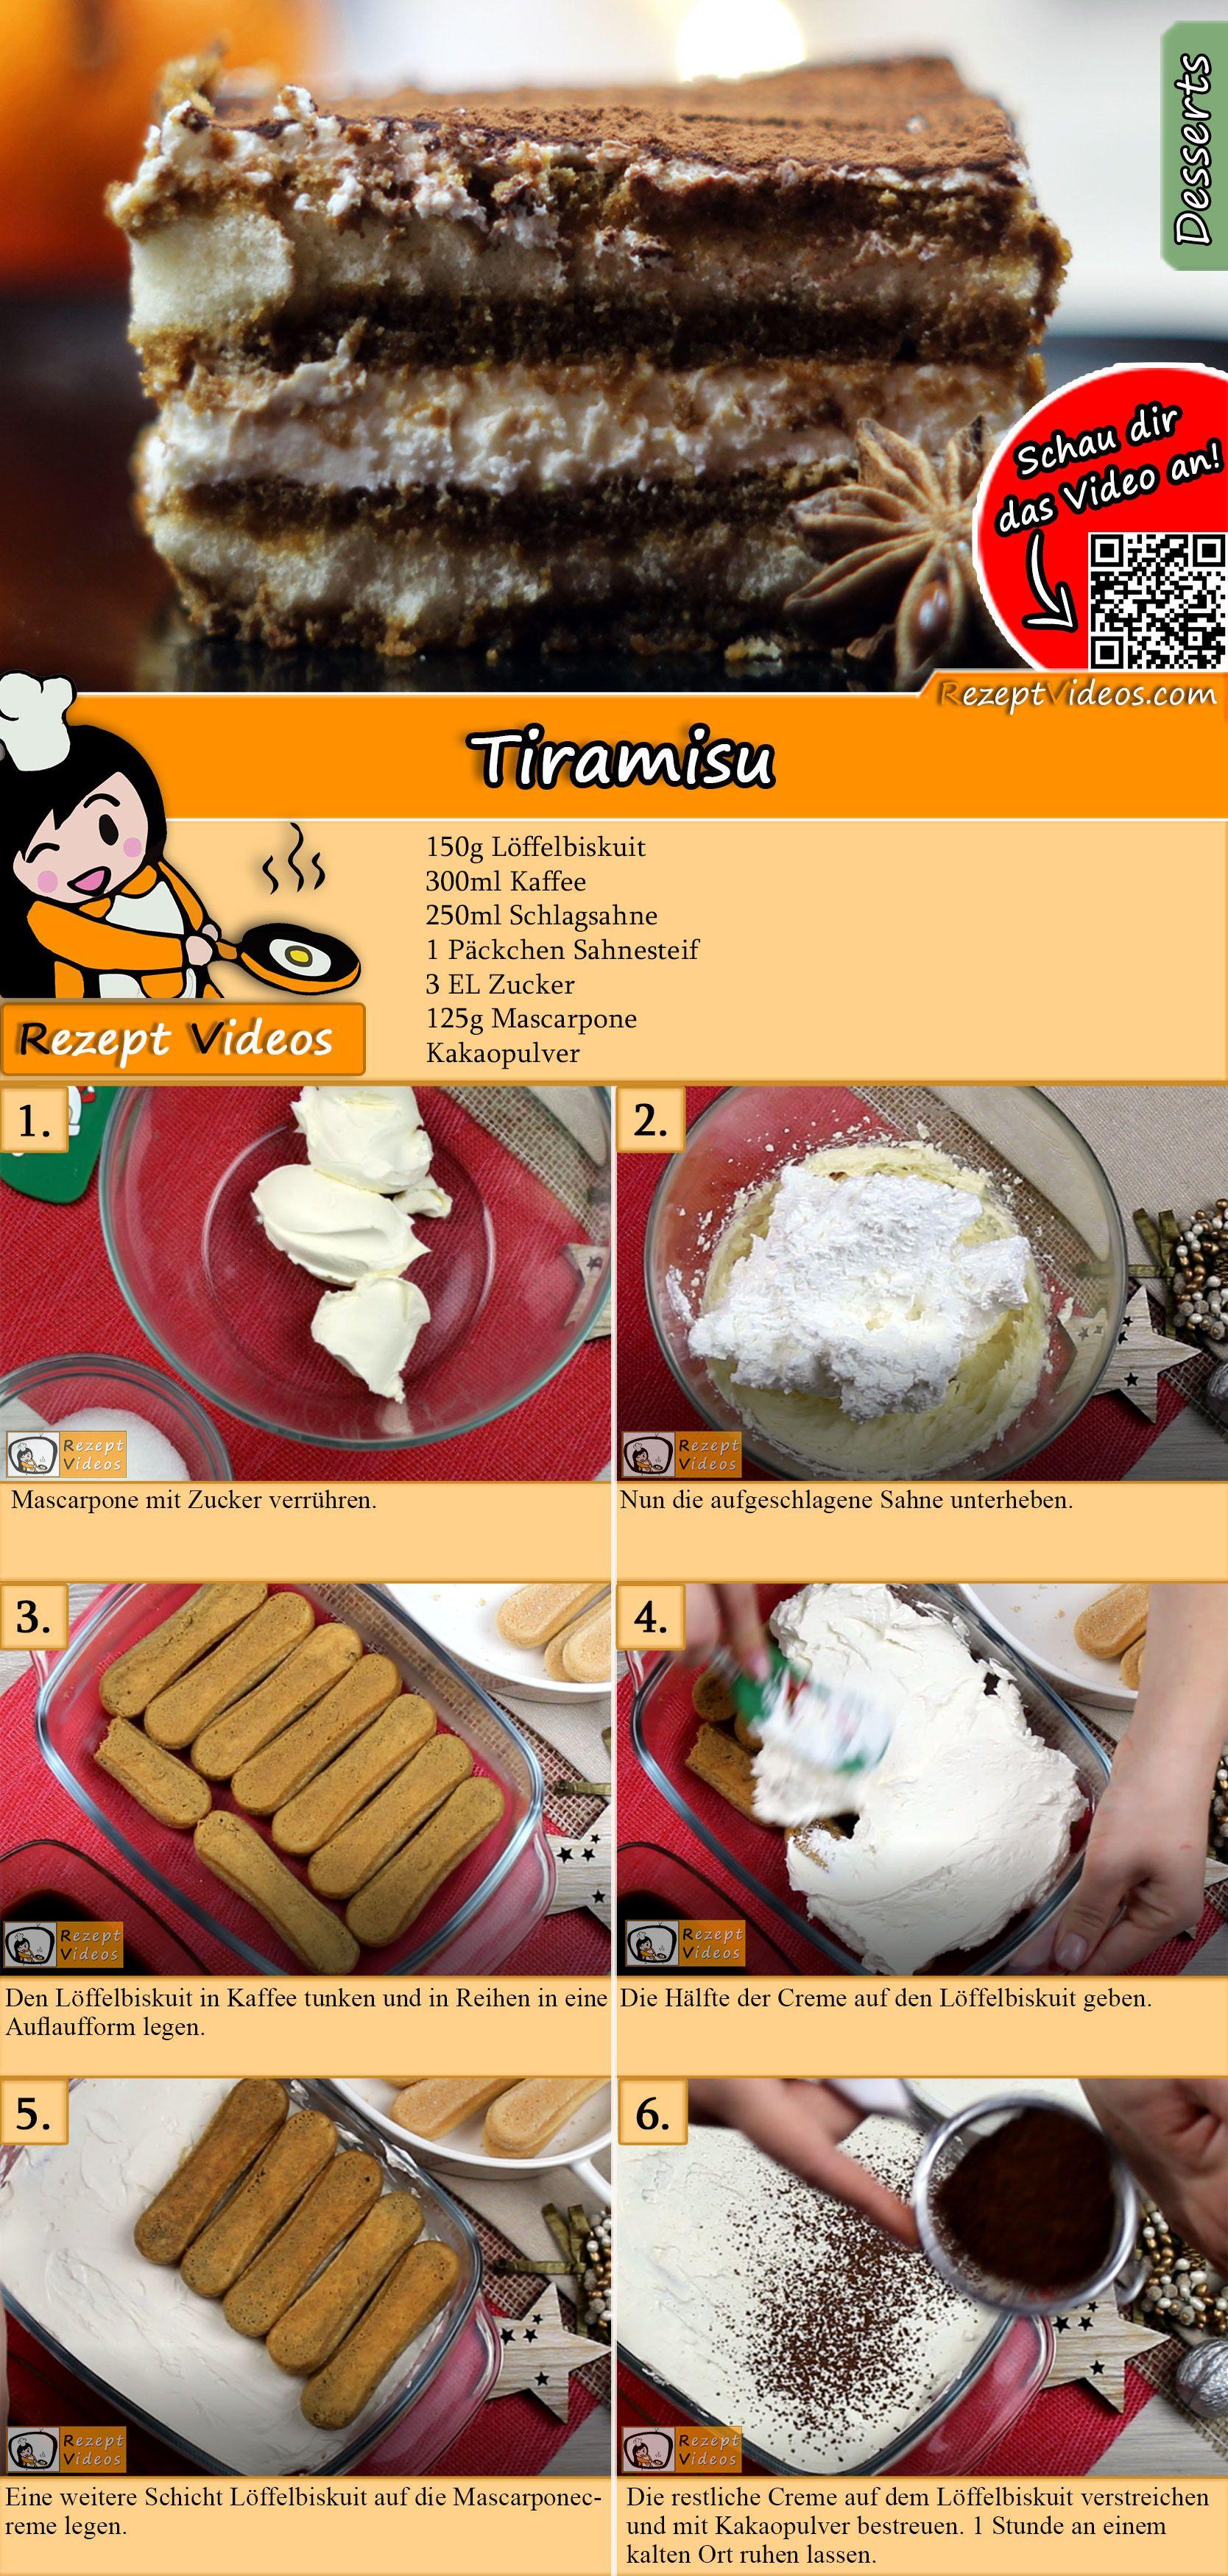 Tiramisu Rezept mit Video - Dessert Rezepte/ Nachtisch Rezepte